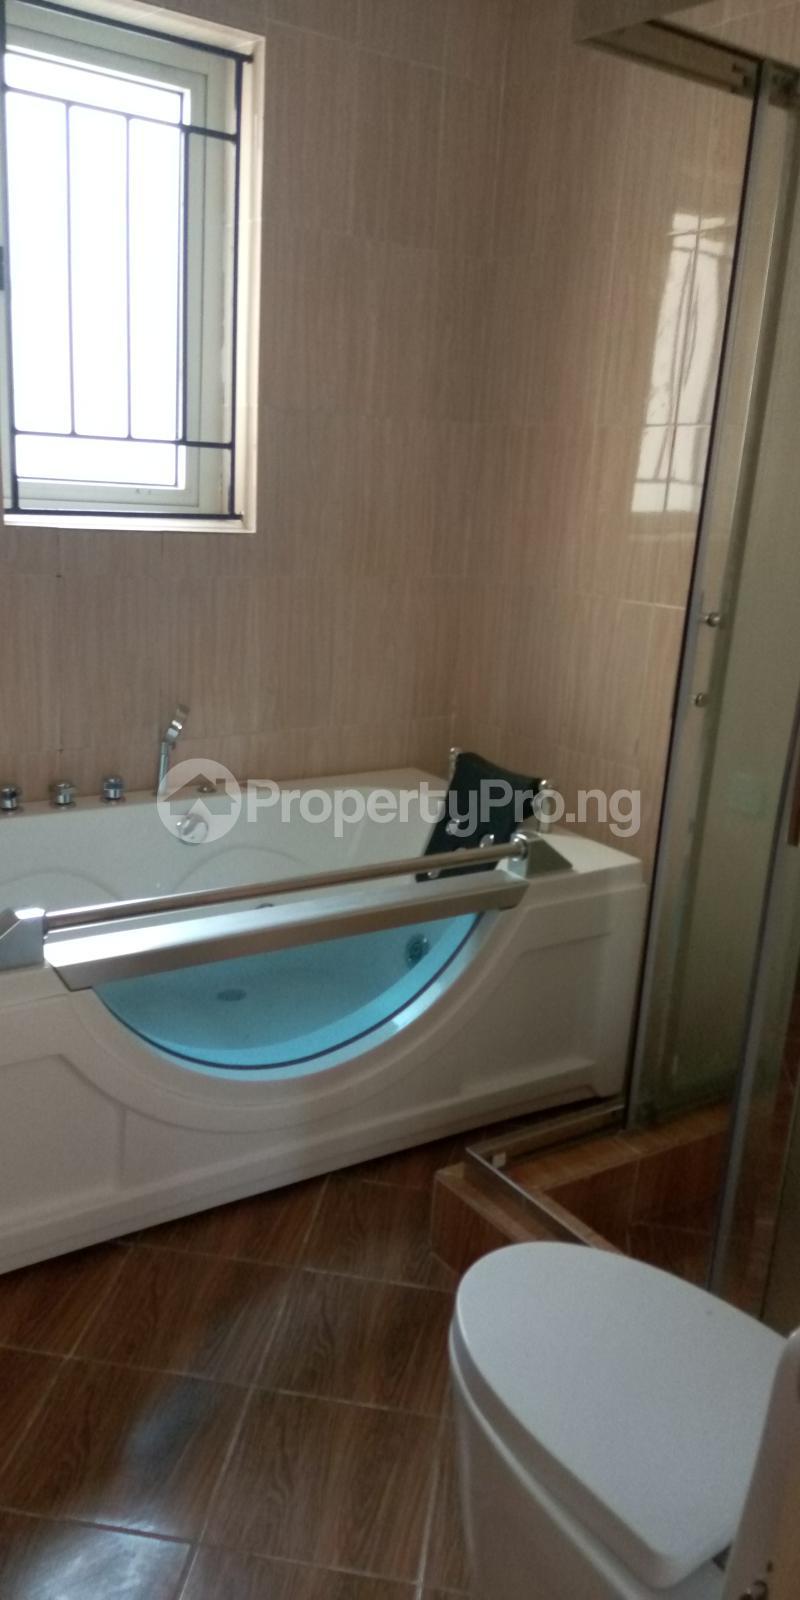 5 bedroom Detached Duplex House for rent Peace Gardens Estate Monastery road Sangotedo Lagos - 9